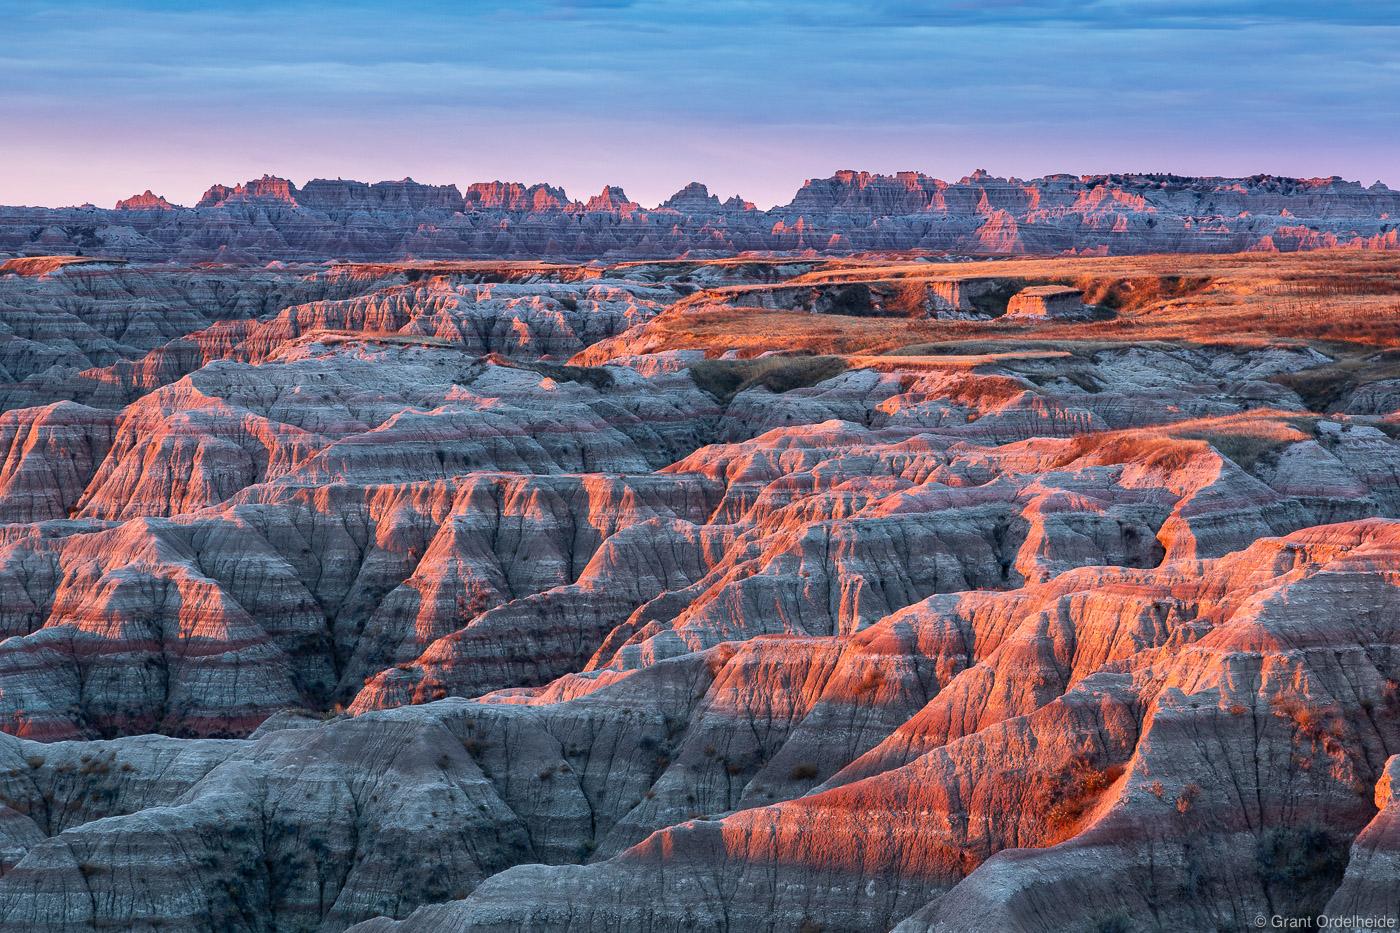 Sunrise over the arid landscape of South Dakota's Badlands National Park.